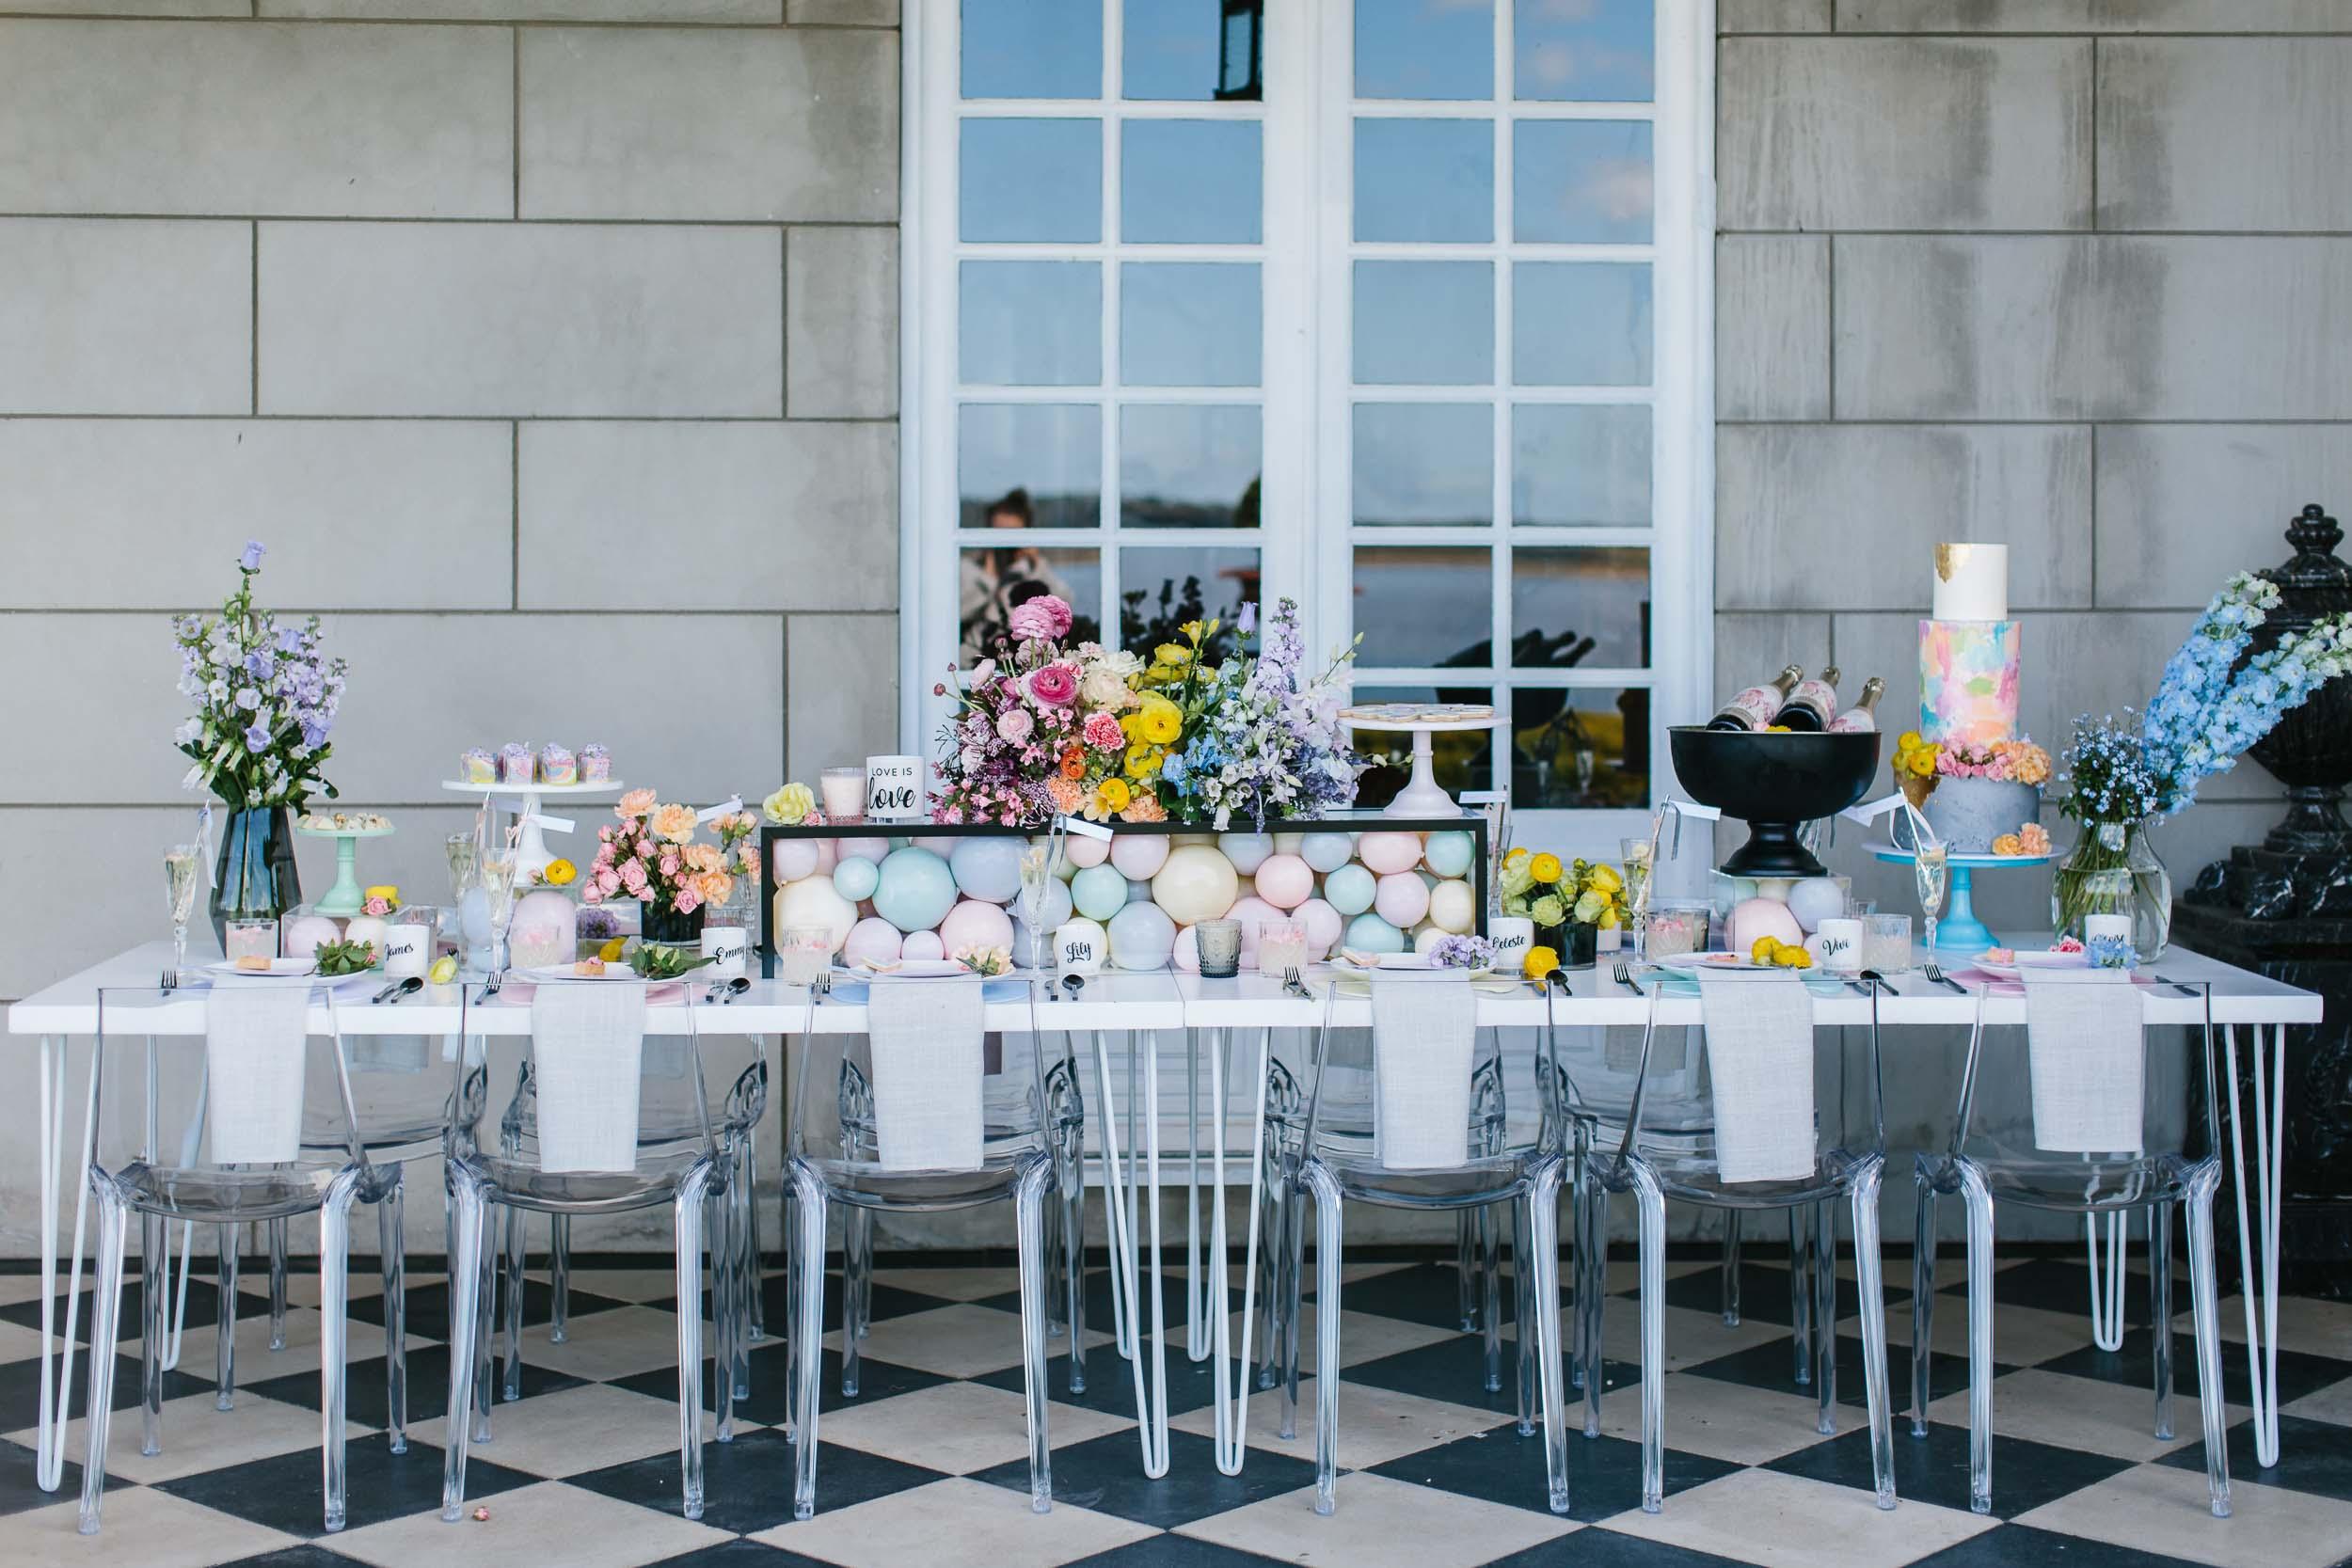 Colourful Rainbow Table Setting | Wedding Photography by Kas Richards